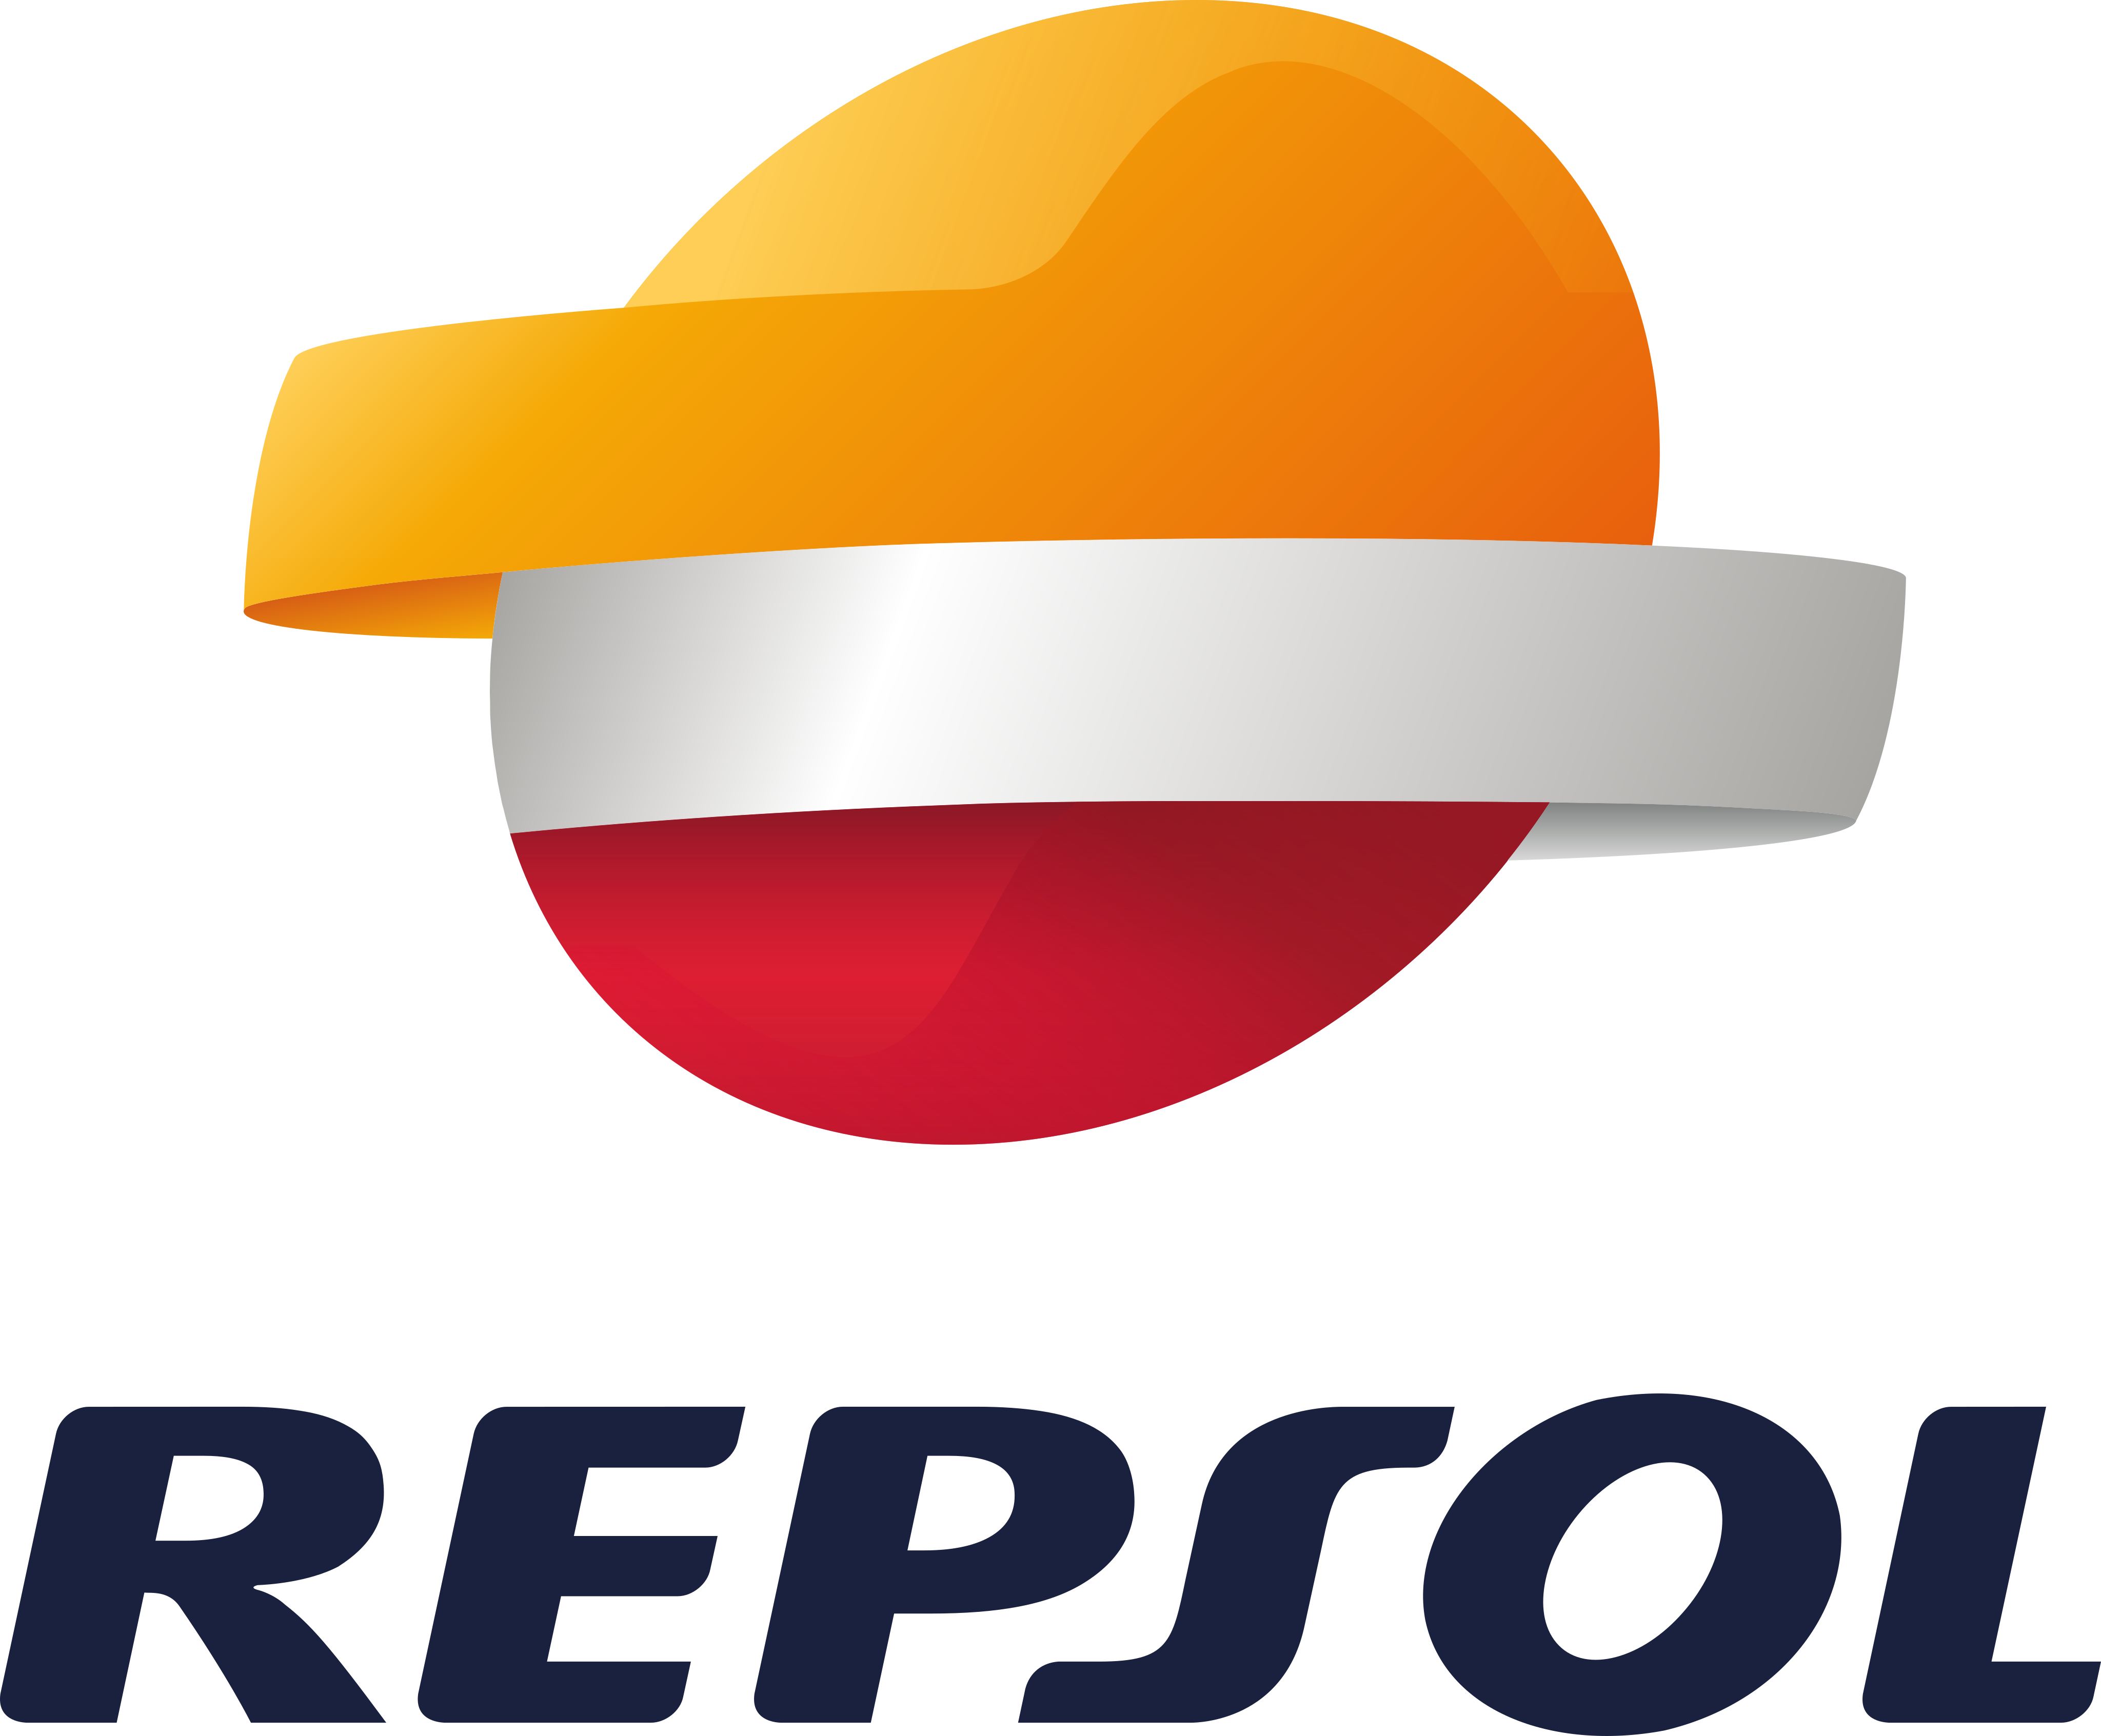 repsol logo 1 - Repsol Logo